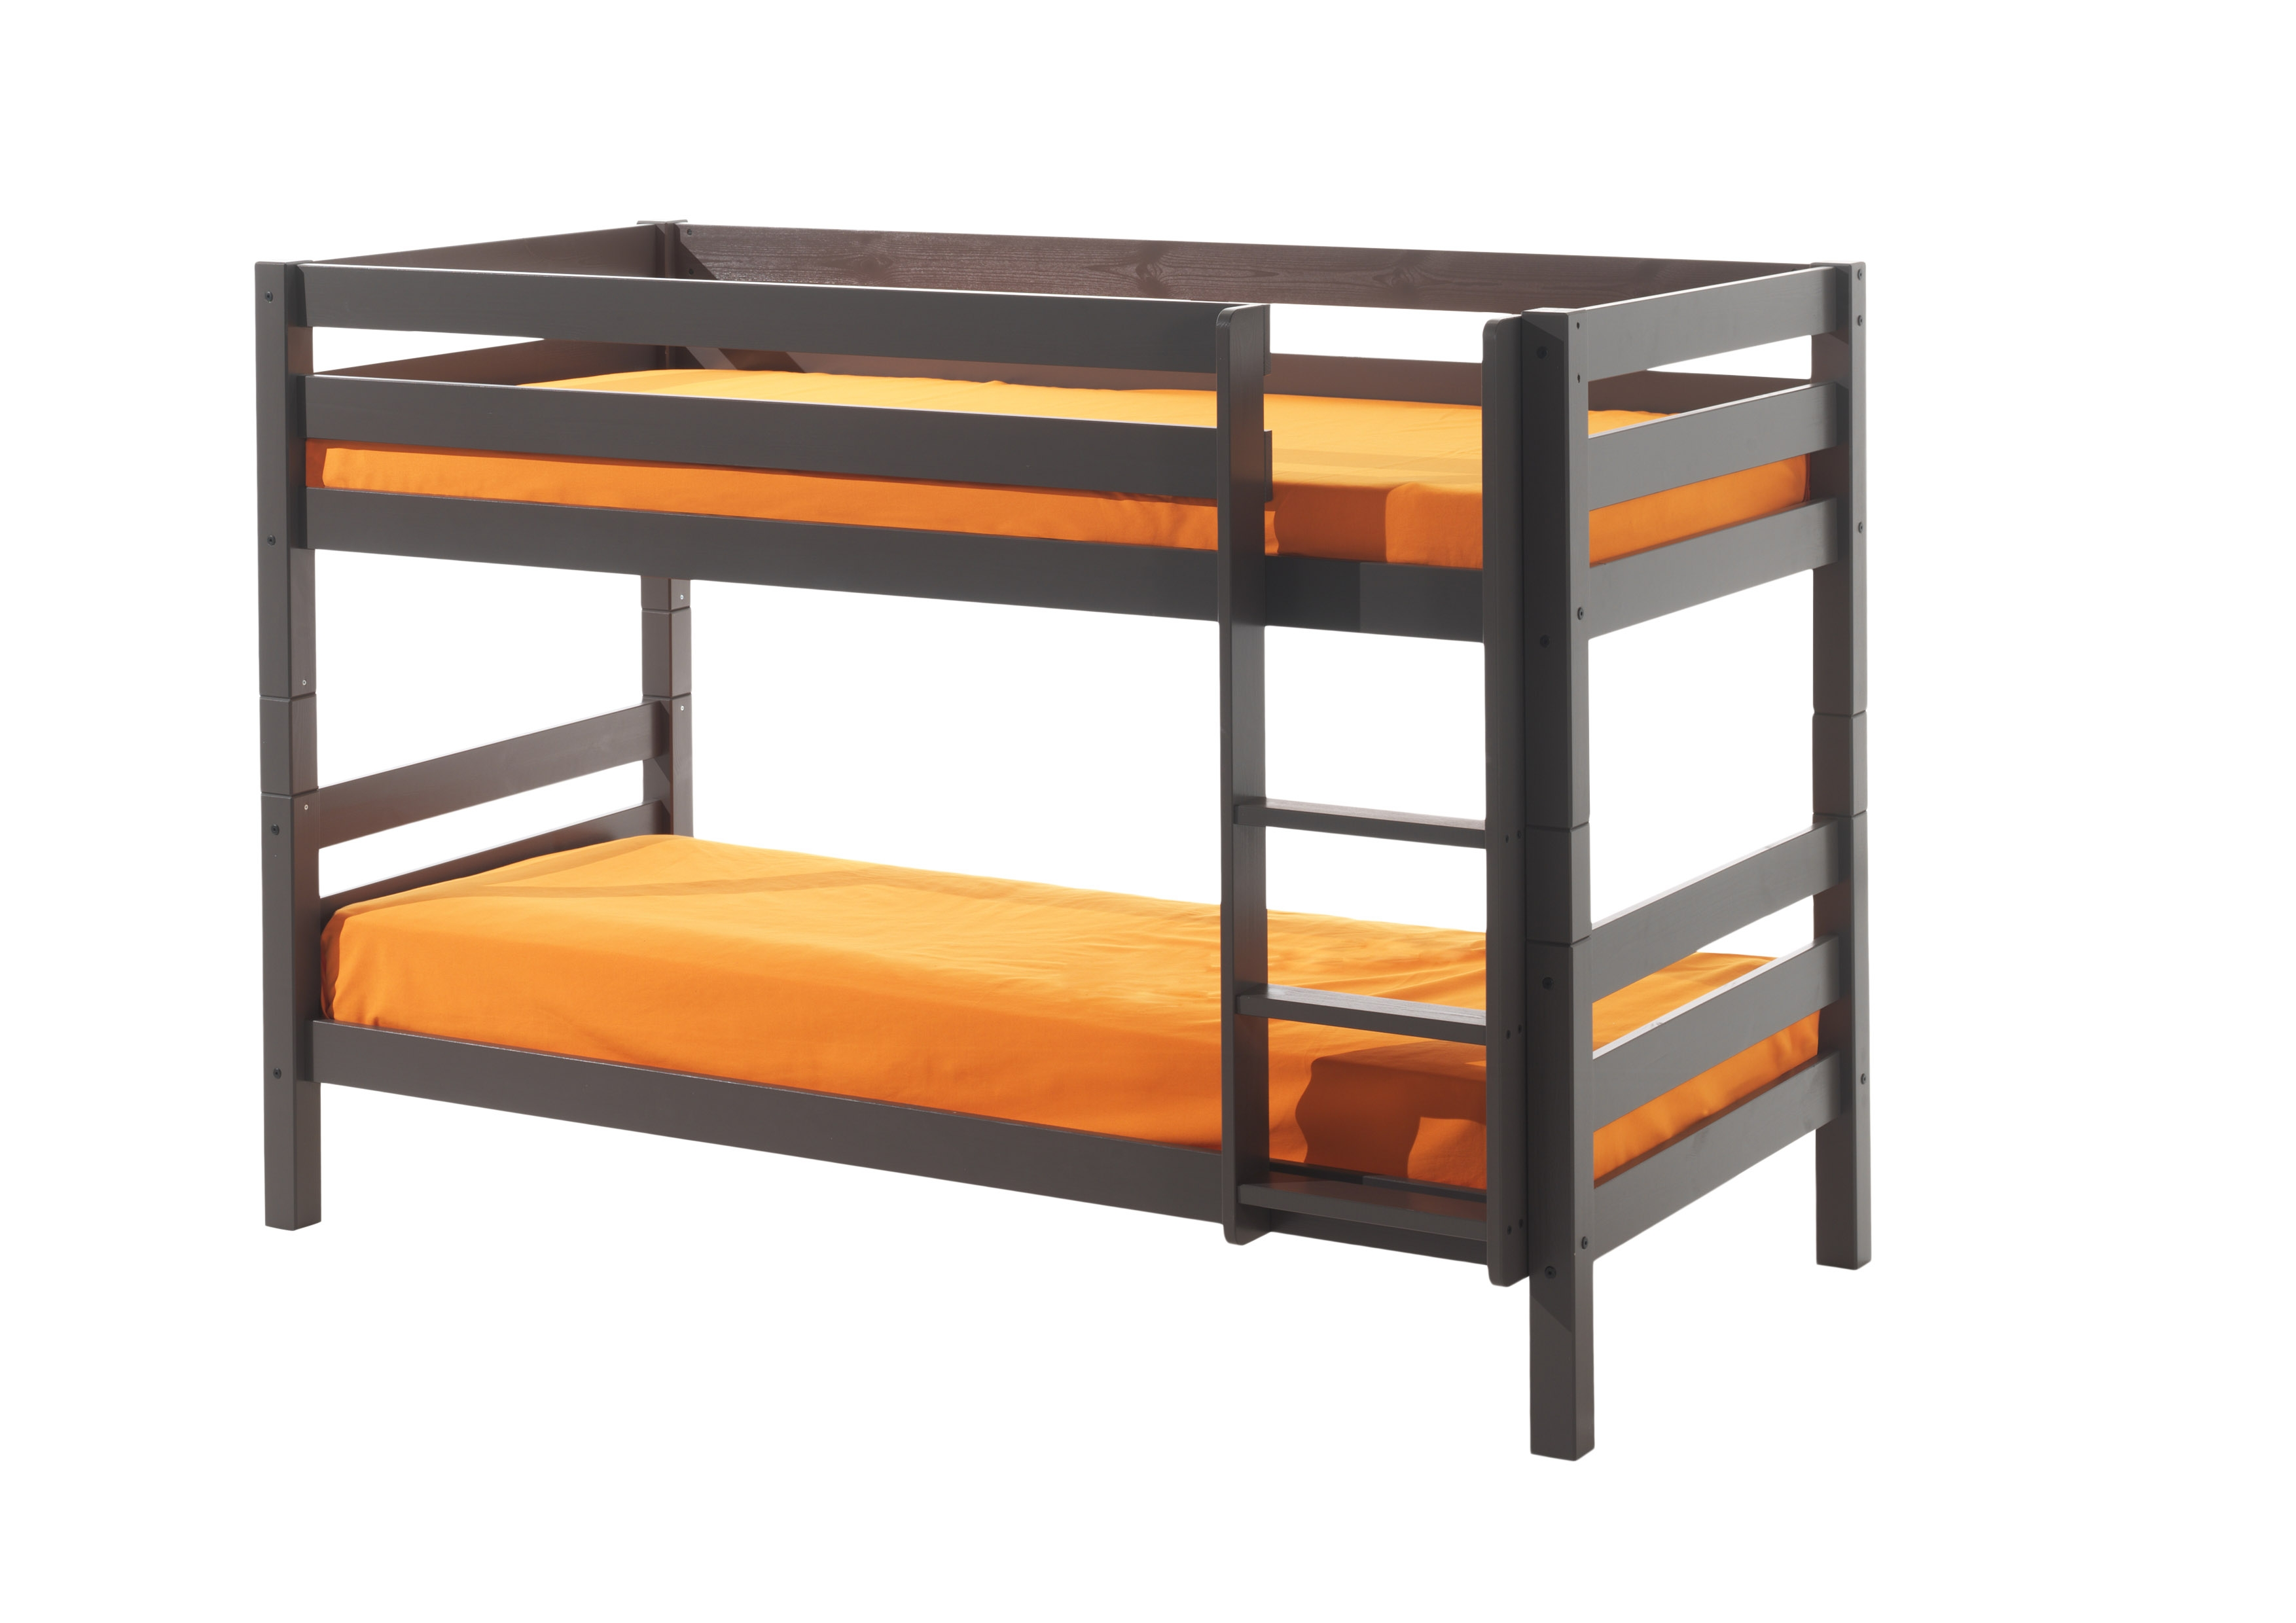 Pat etajat din lemn de pin pentru copii Pino Small Grej, 200 x 90 cm